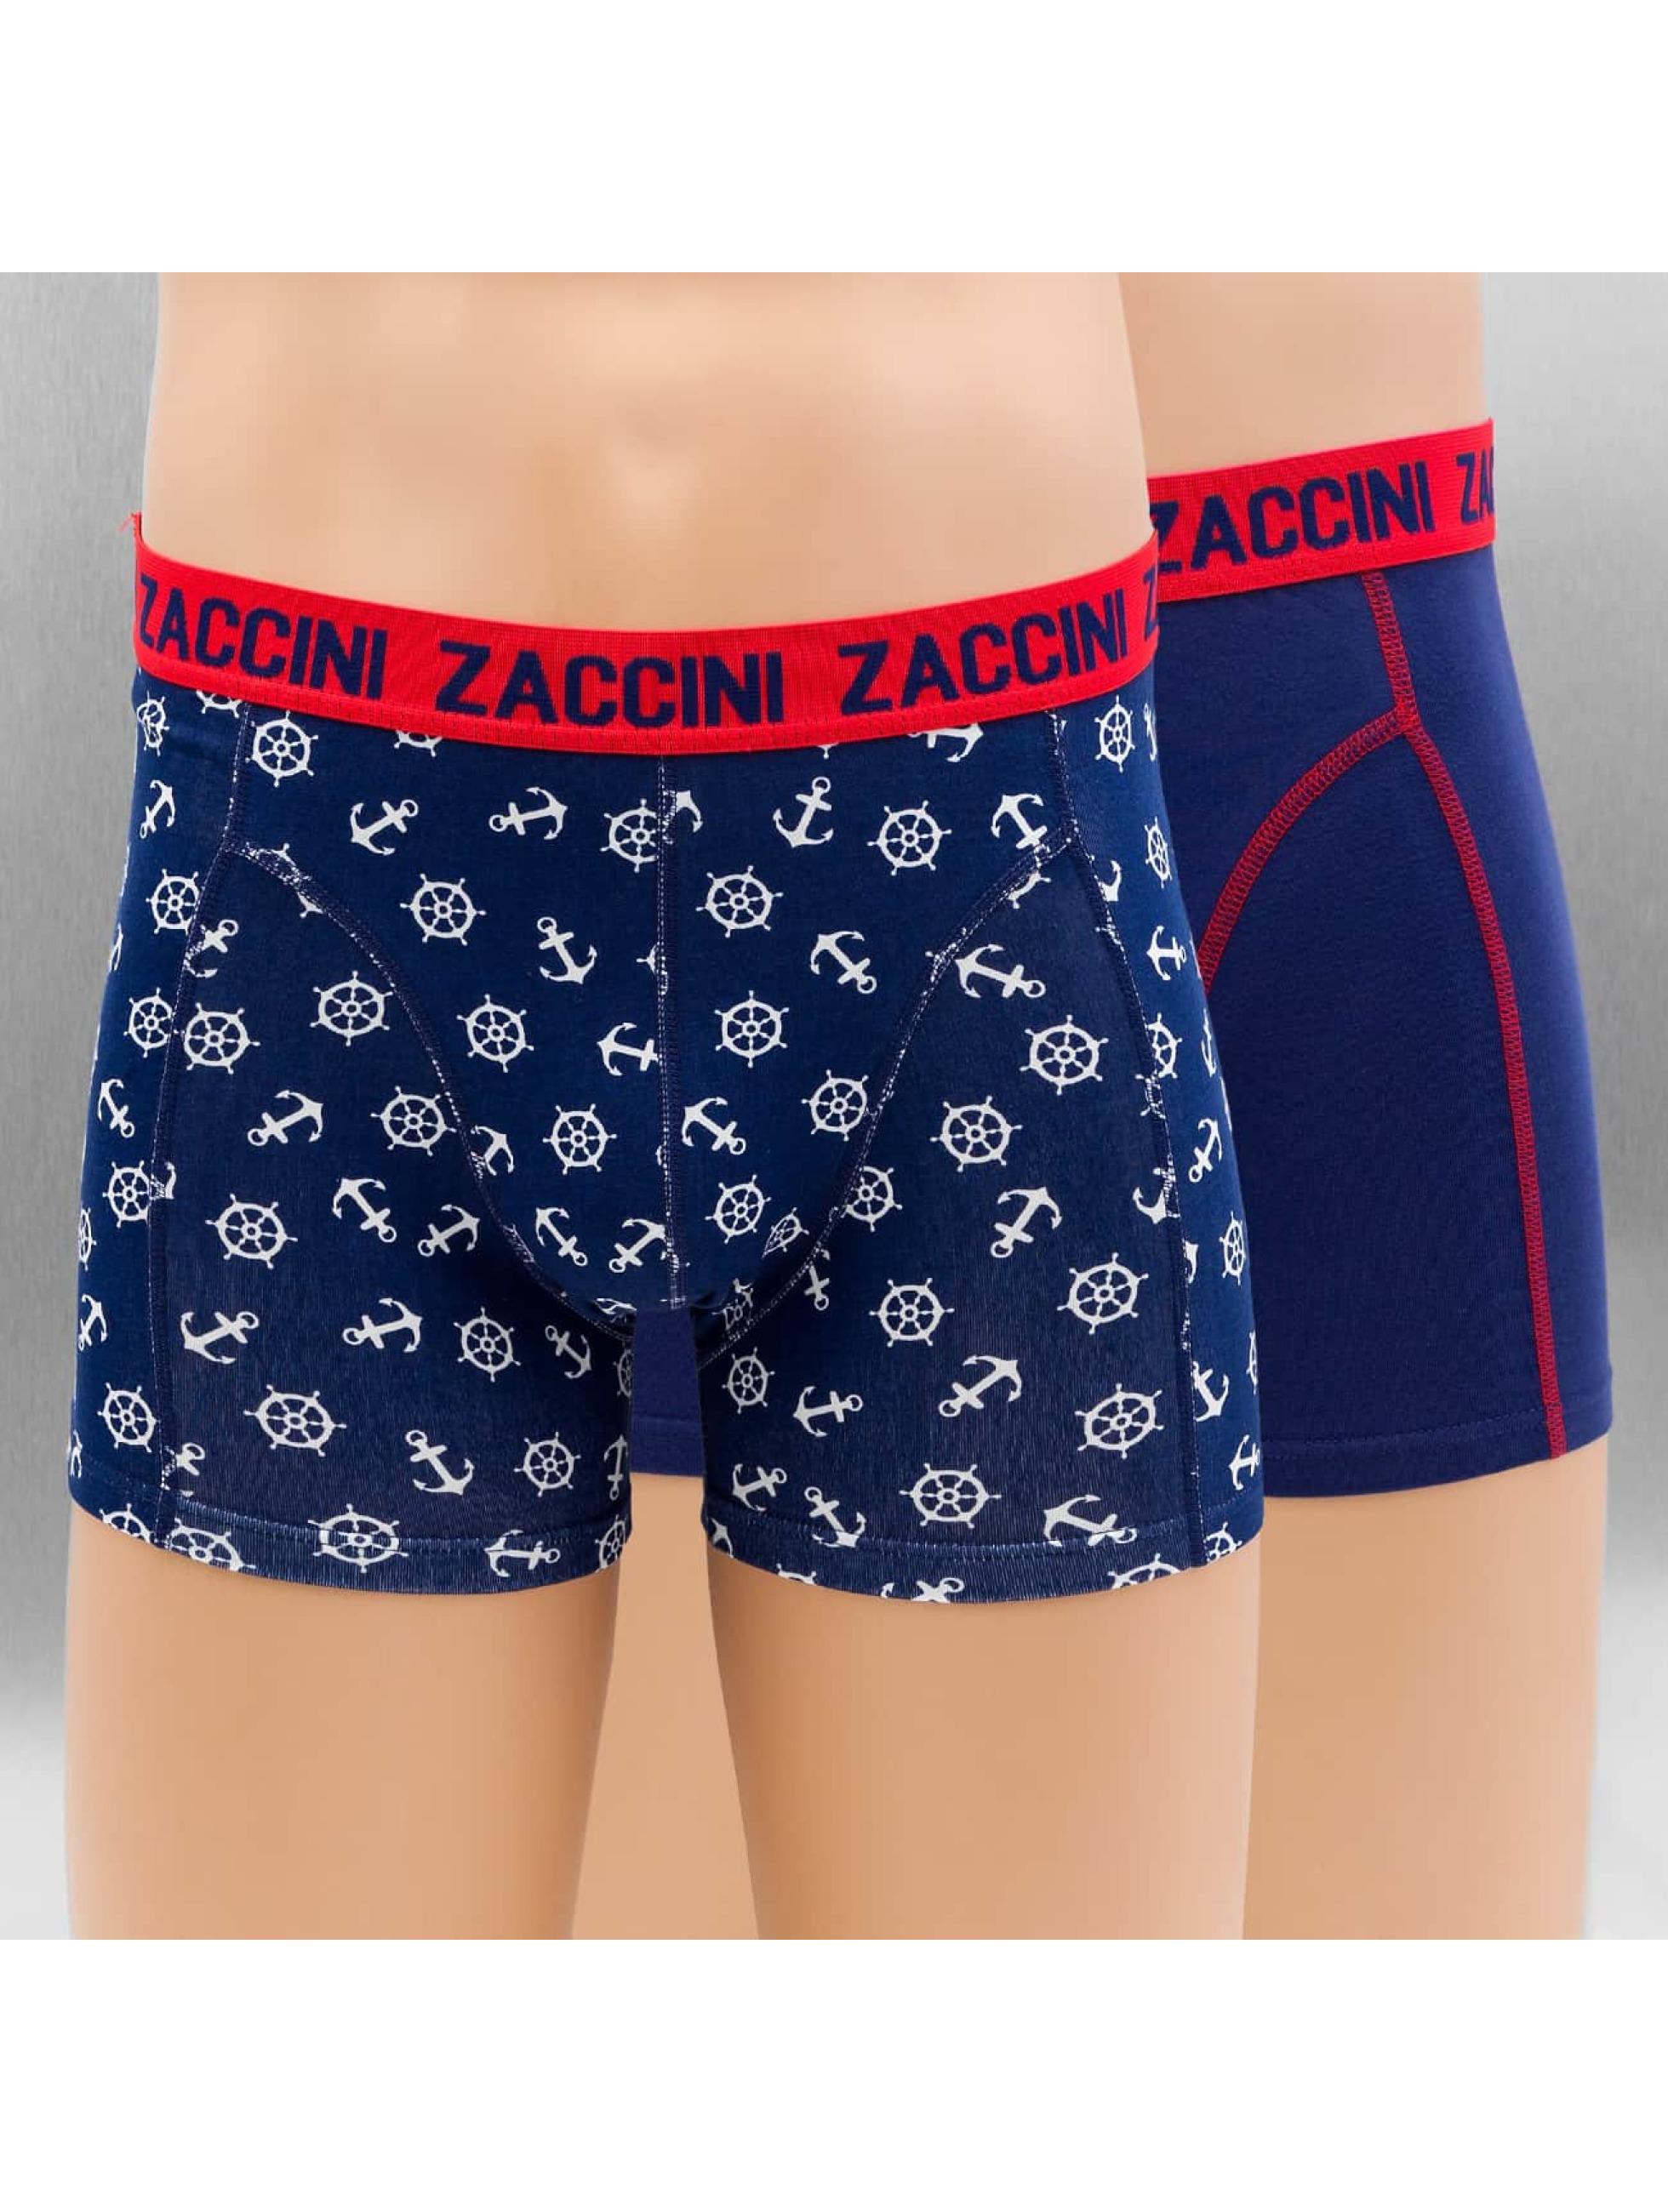 Zaccini Männer Boxershorts Nautical 2-Pack in blau